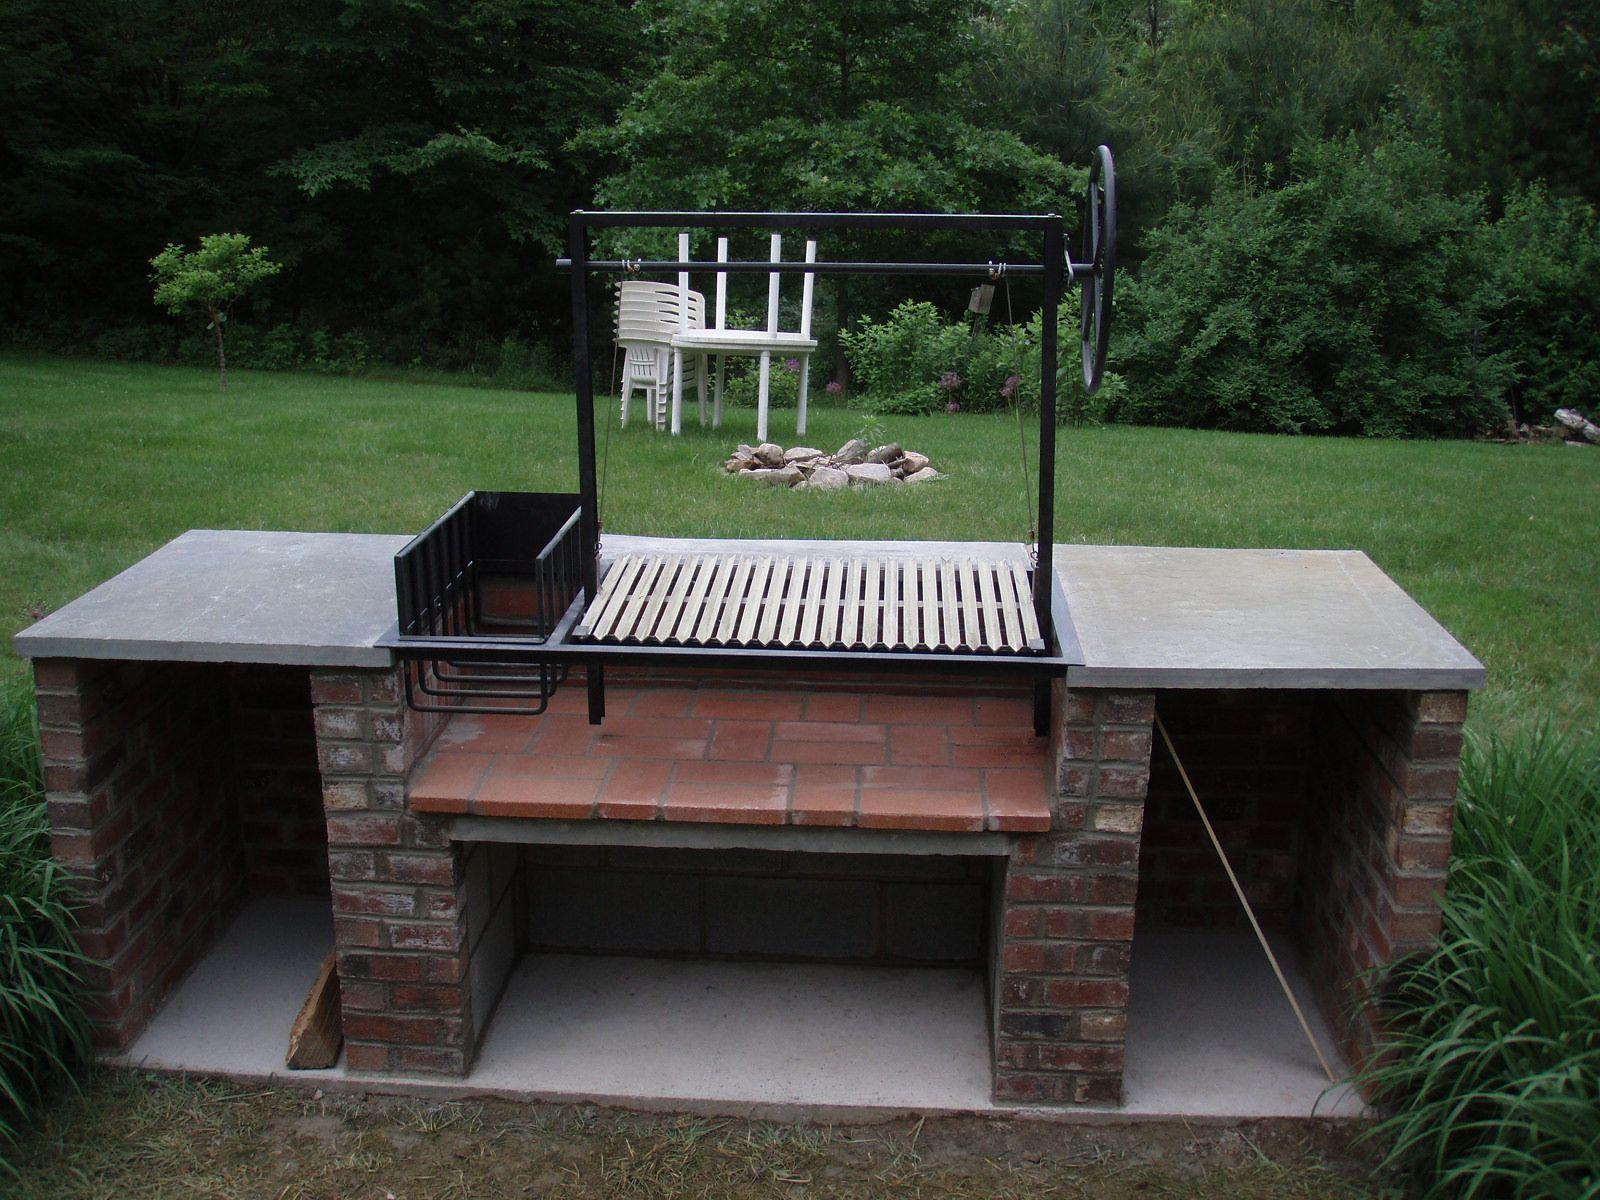 Diy Argentine Grill Plans Home Ideas Grill Kit Outdoor Kitchen Brick Bbq